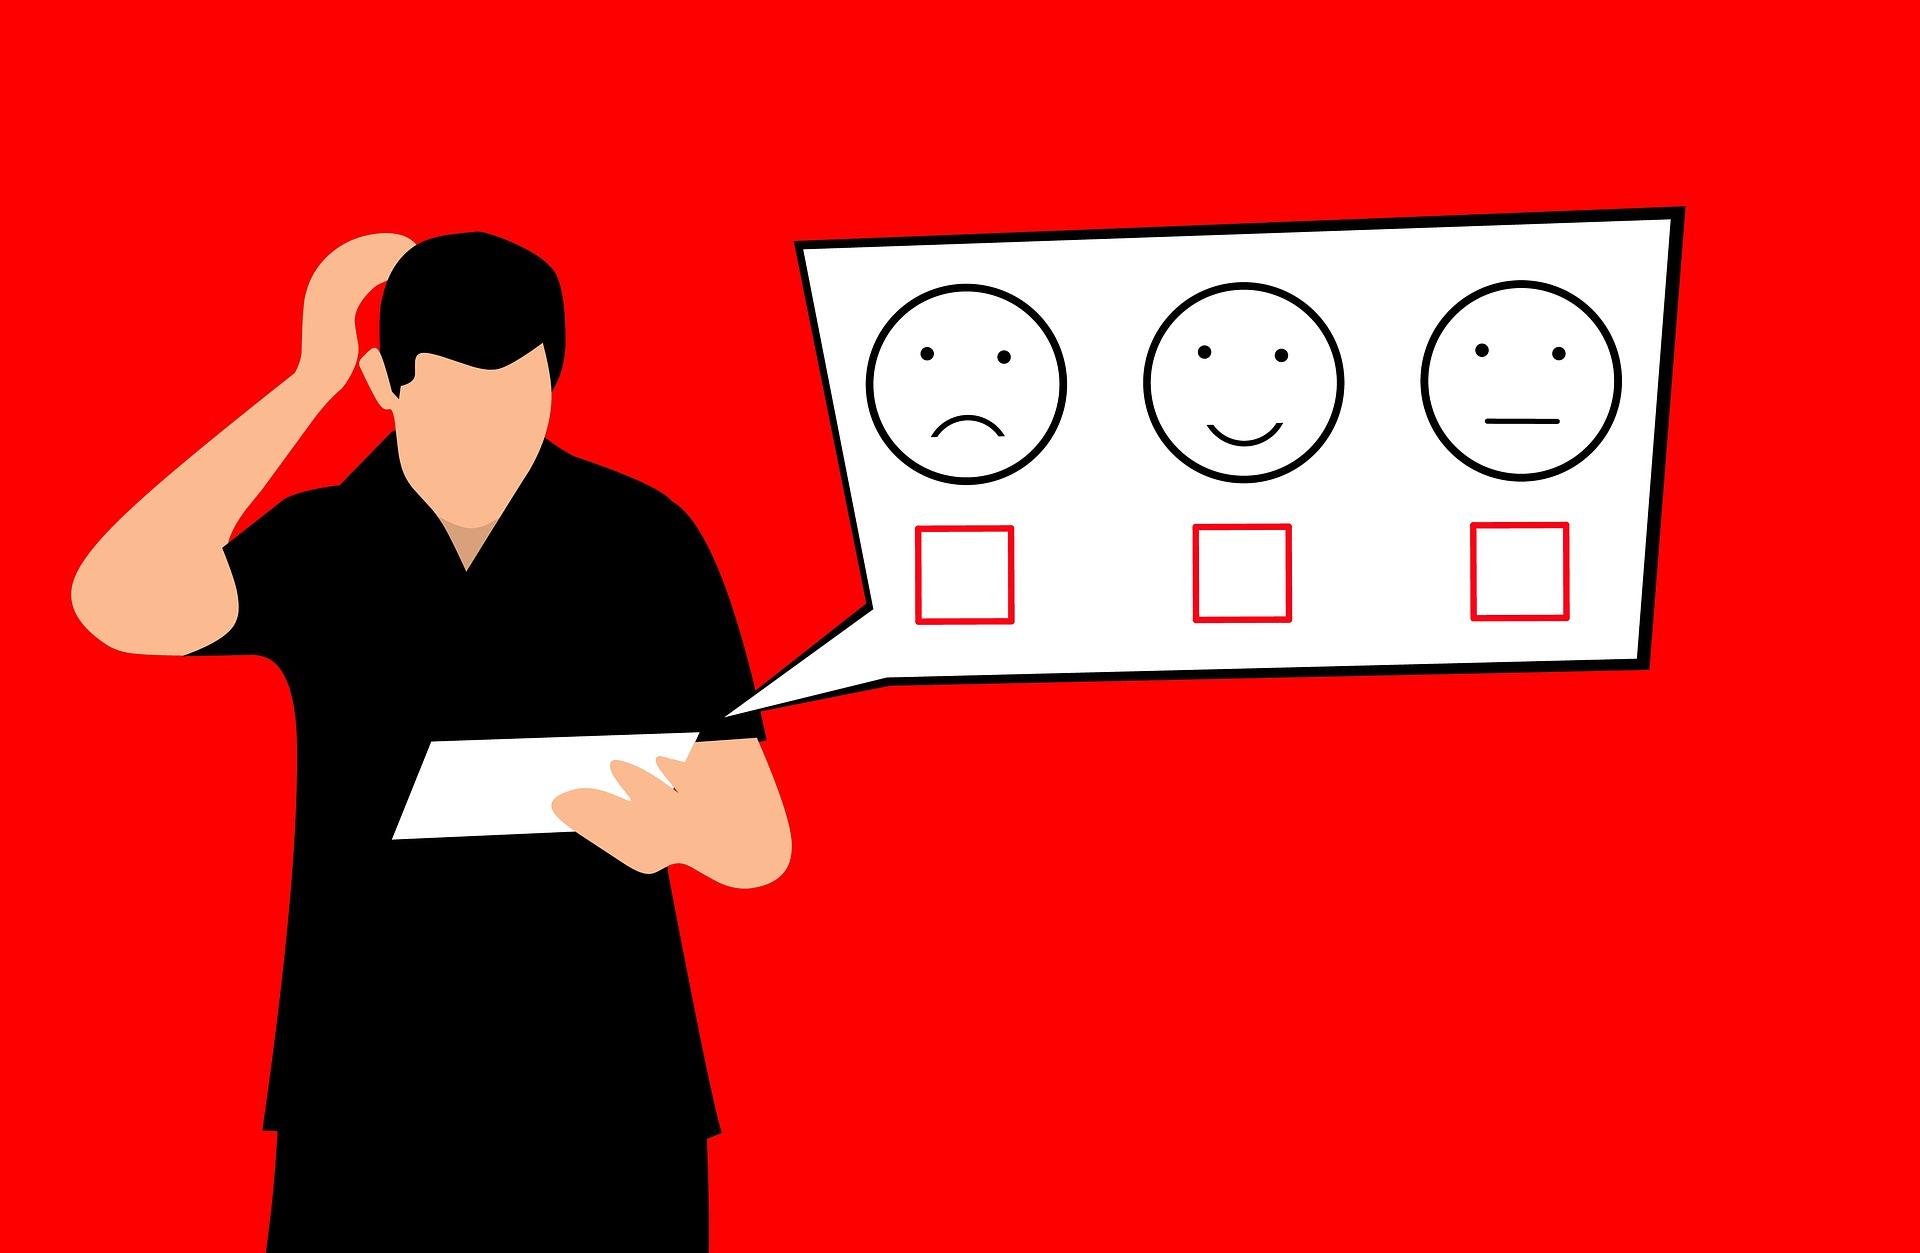 Review of idealollipop.com - Read Customer Service Reviews